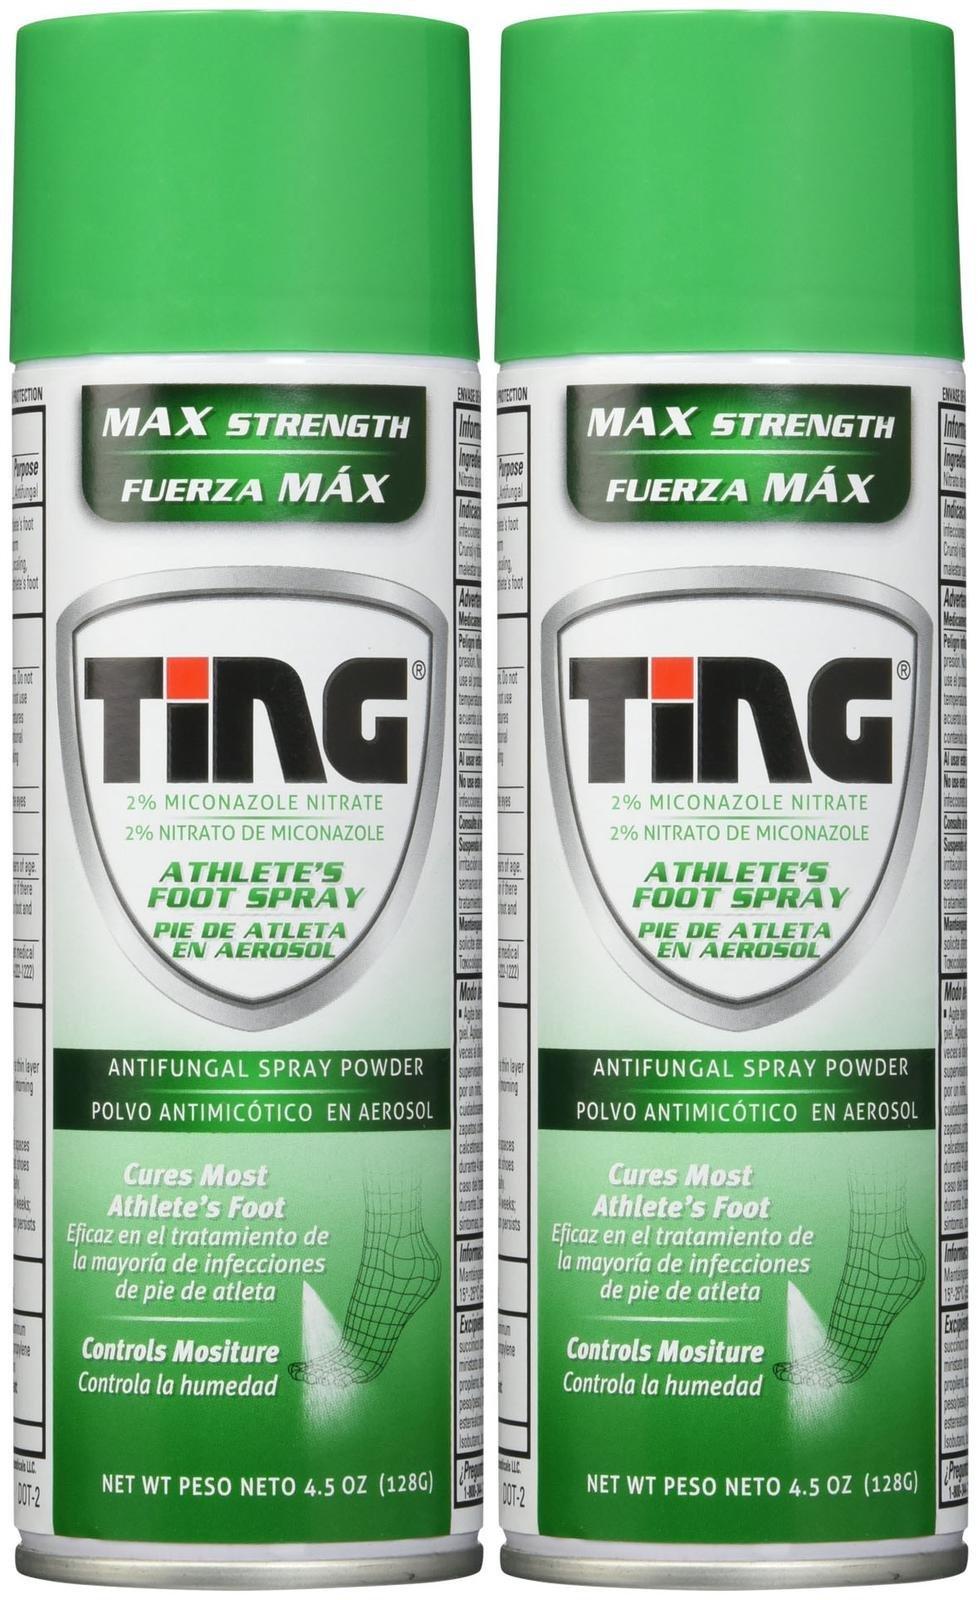 Ting Athlete's Foot and Jock Itch Anti-Fungal Spray Powder, 2 pk